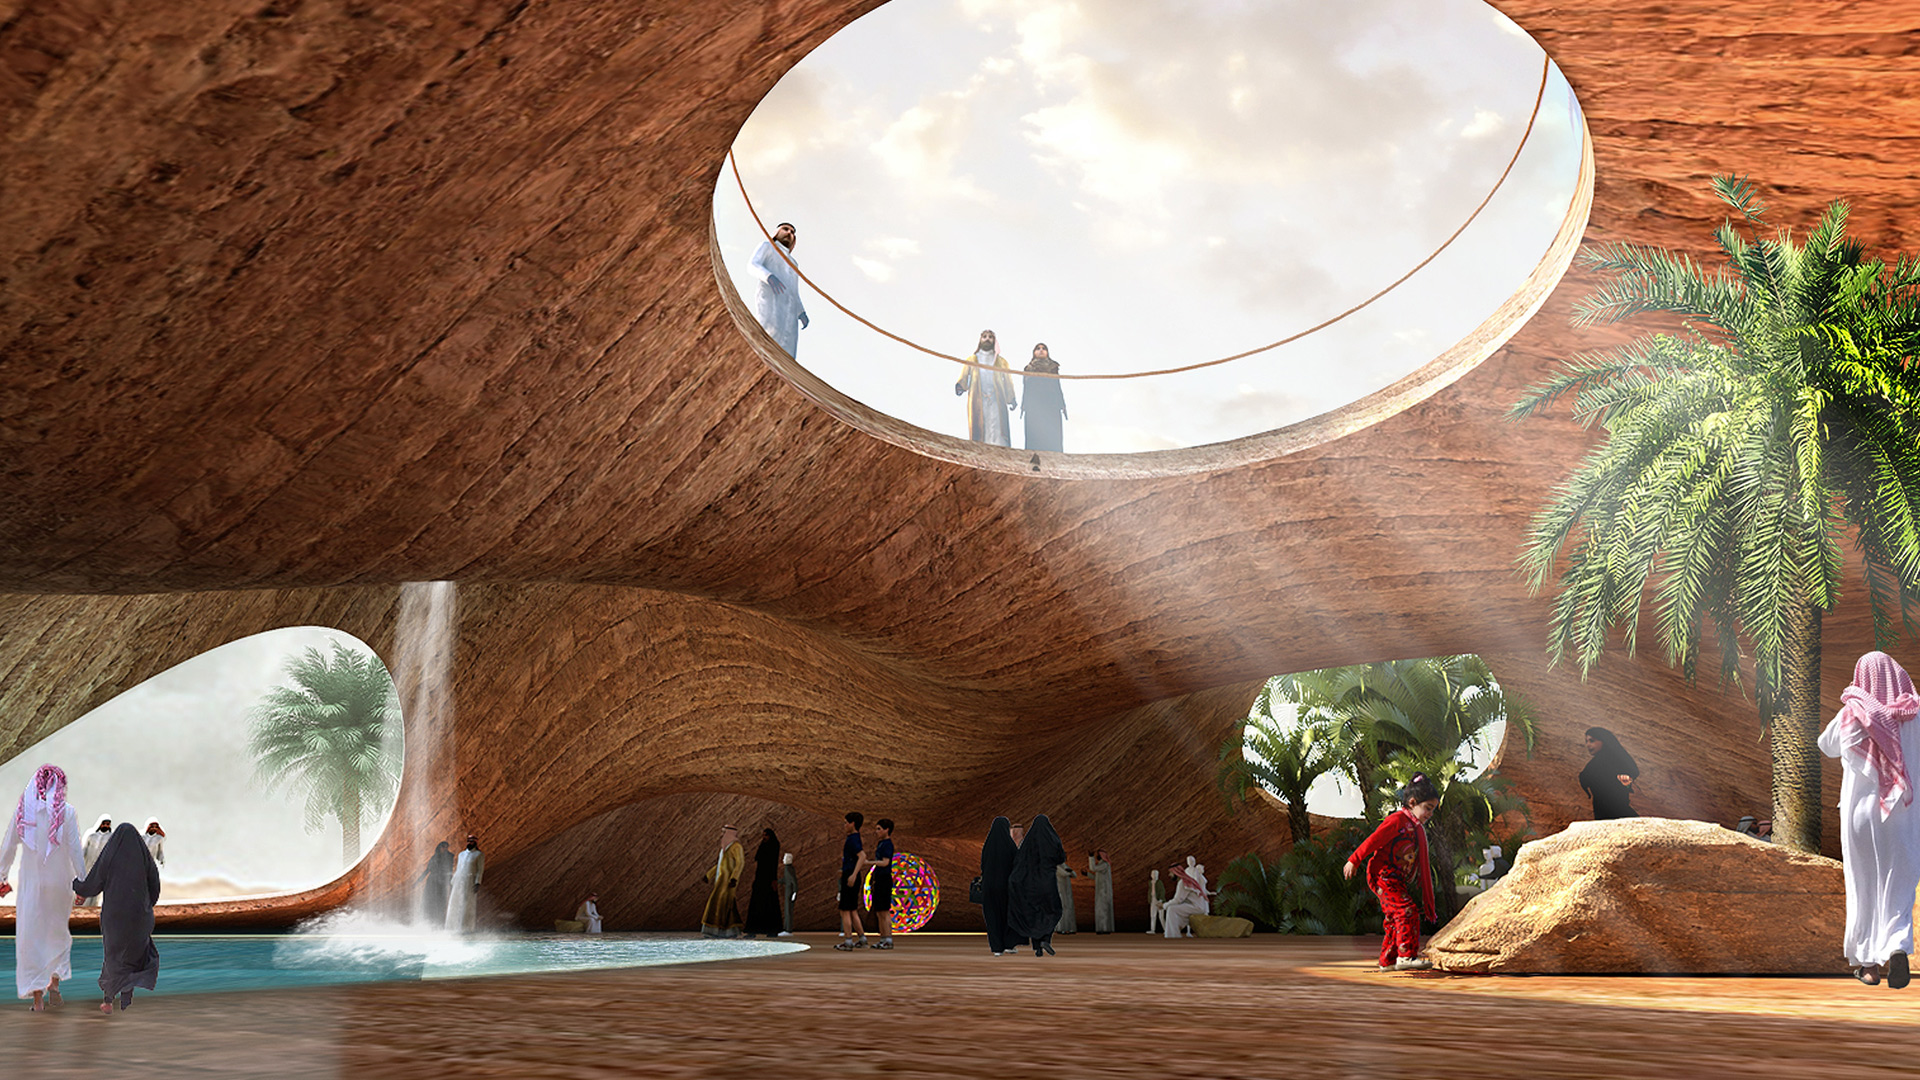 MAP-design-nature-reserve-architecture-kiran-mathema-architect-sinkhole-visitor-center-interior